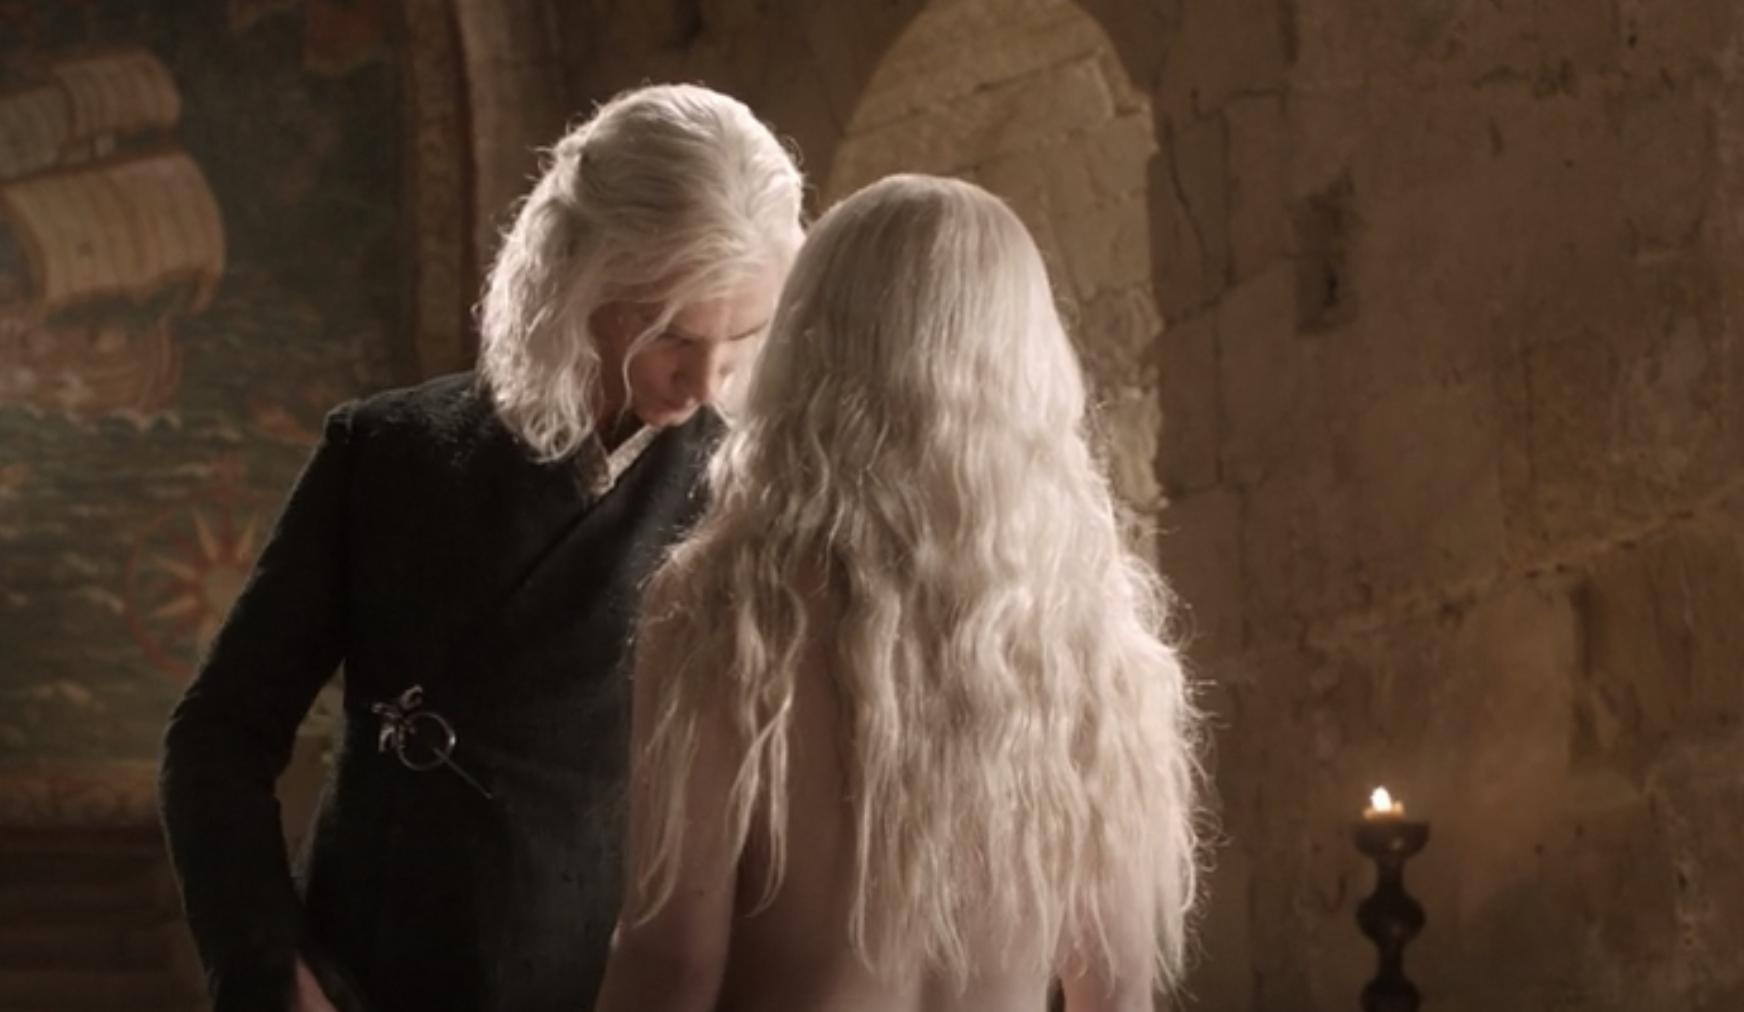 Viserys examining Daenerys' naked body